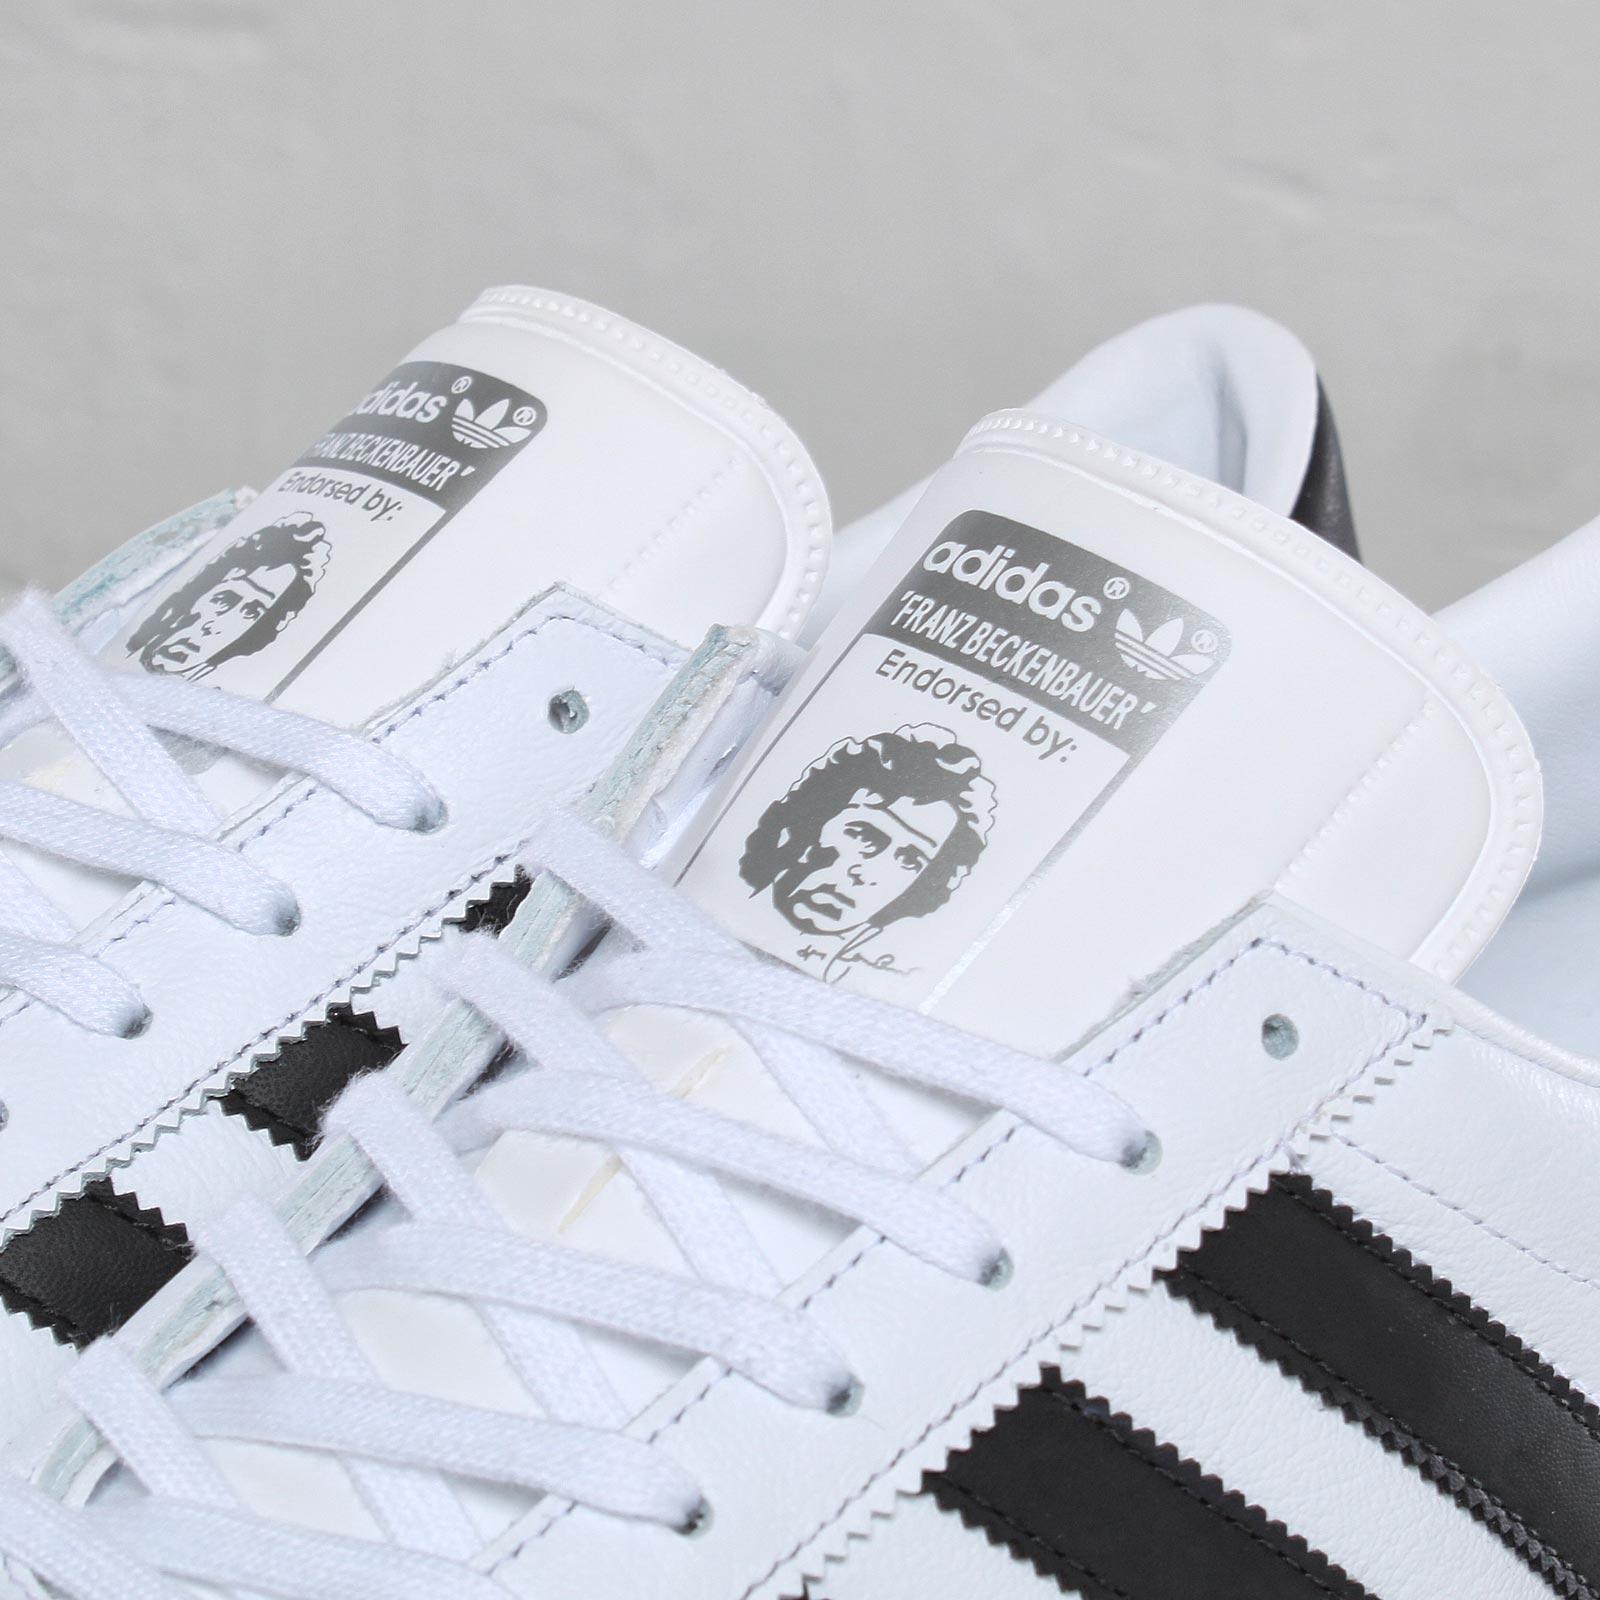 Beckenbauer adidas Beckenbauer Sneakersnstuff adidas adidas Sneakersnstuff 101919 Allround Allround 101919 UVpSzM